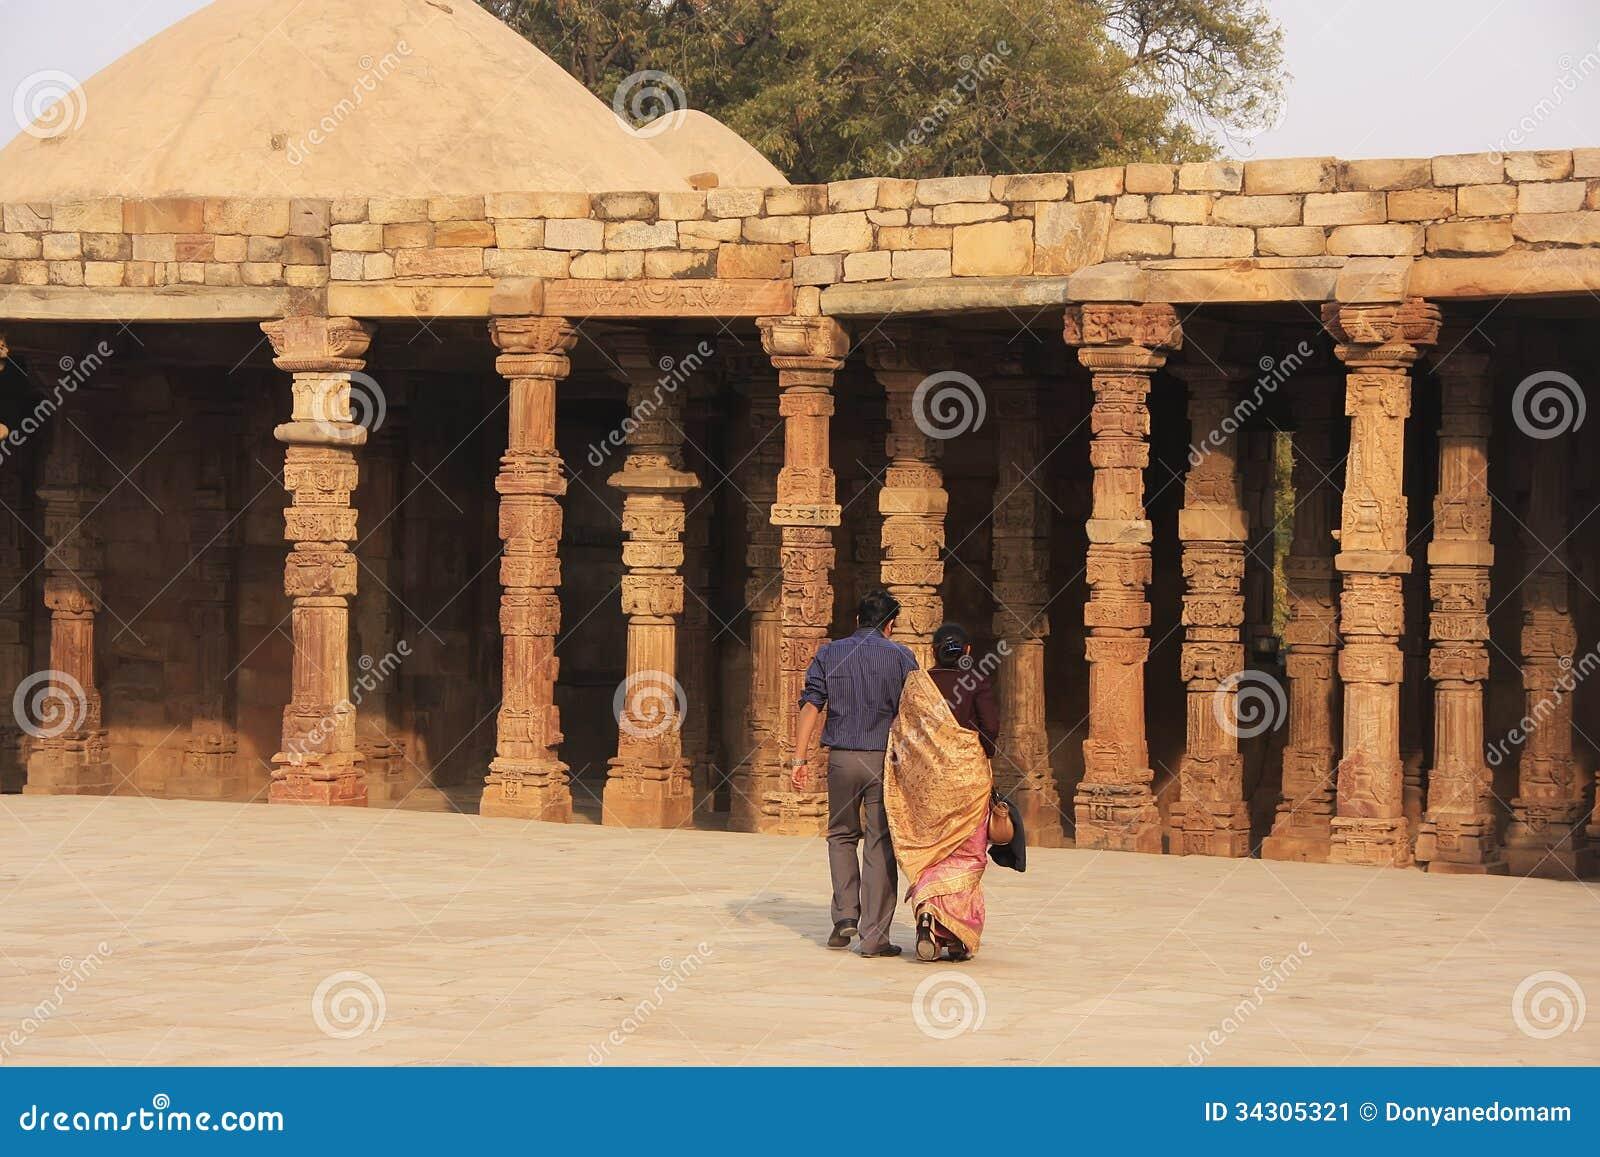 Buy an essay qutub minar in hindi